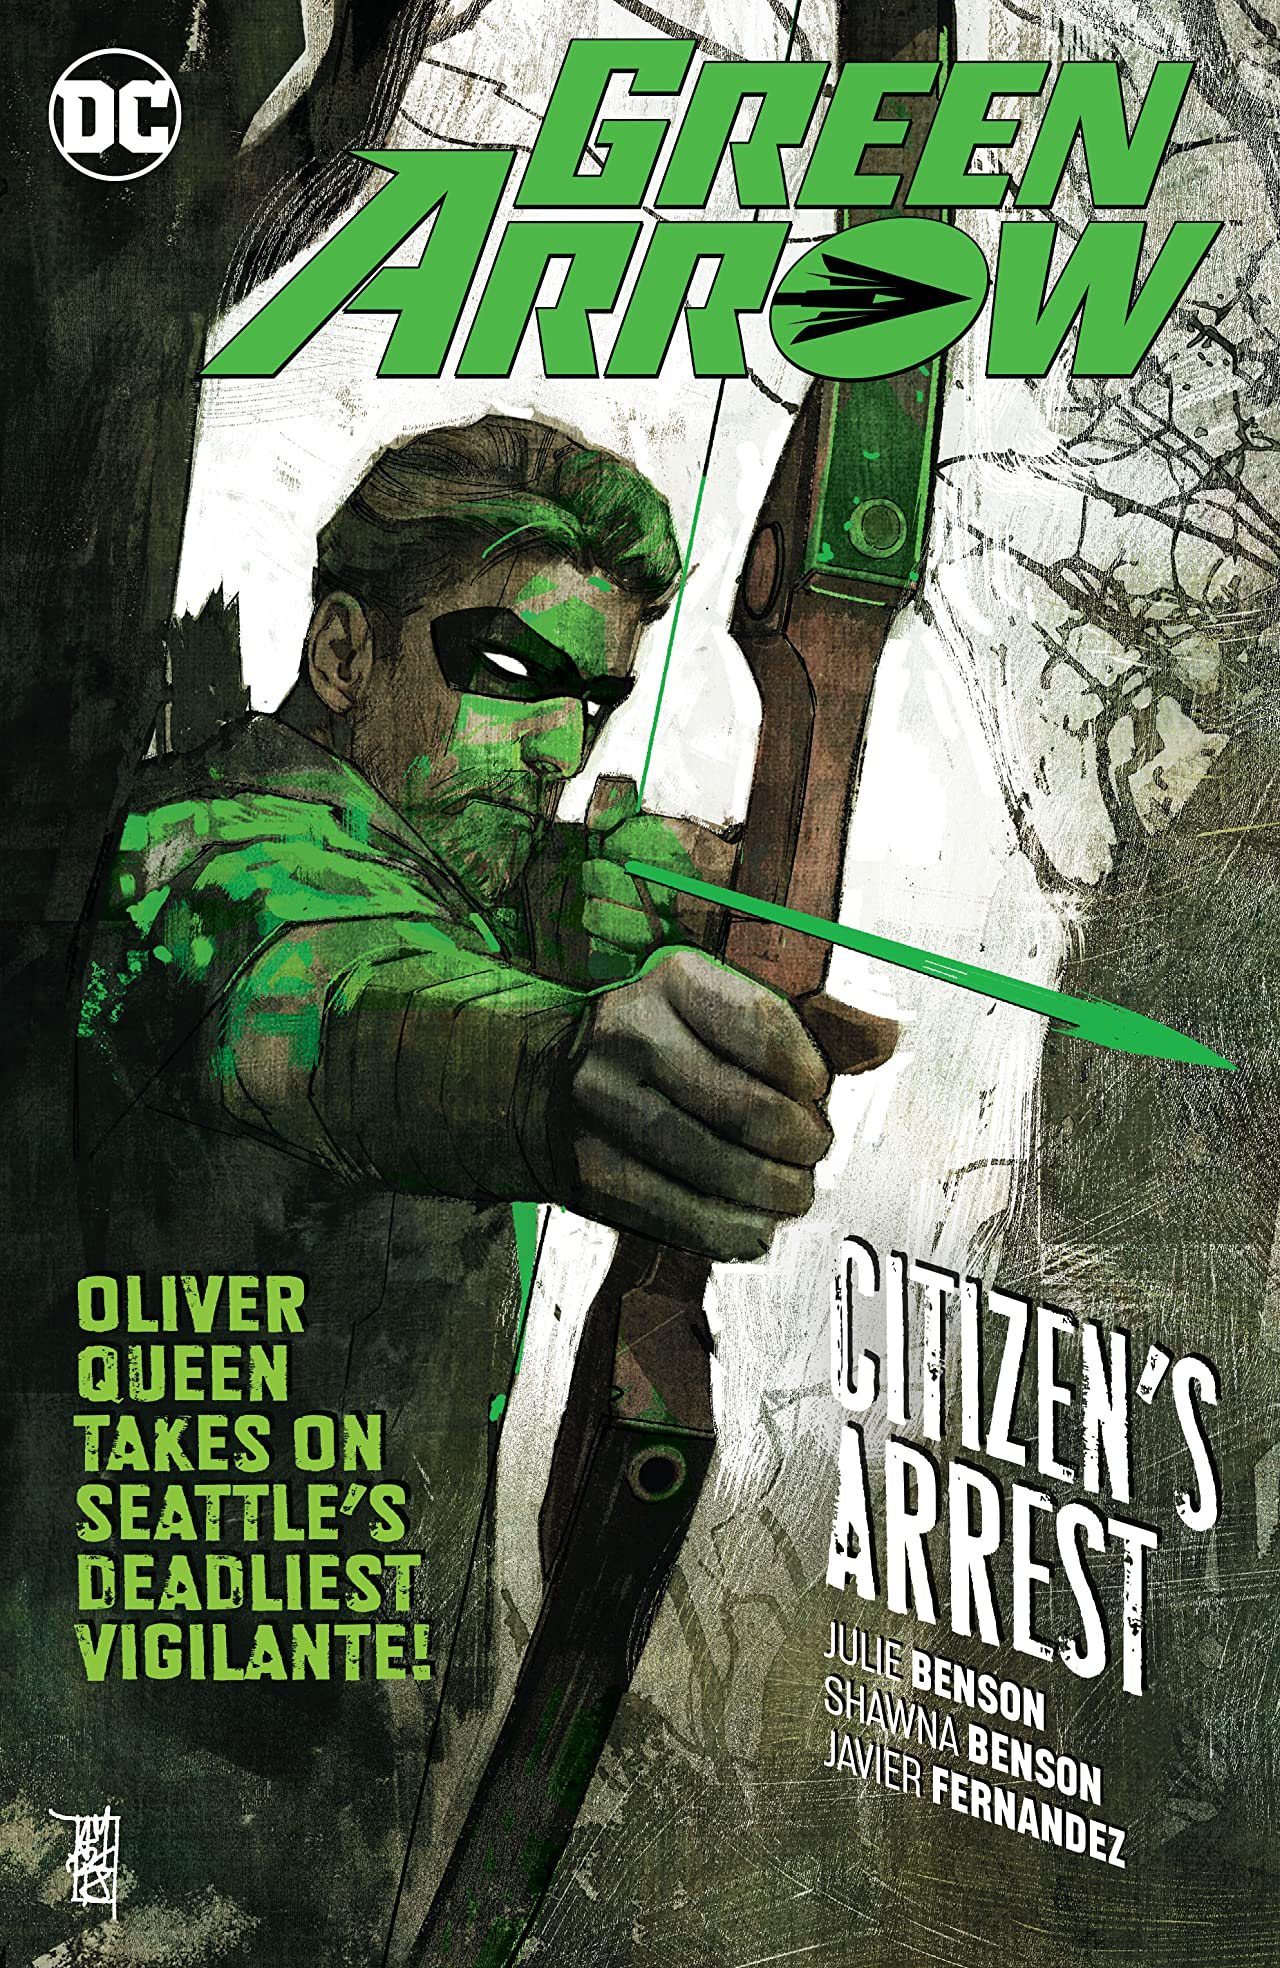 Green Arrow (2016-2019) Vol. 7: Citizen's Arrest